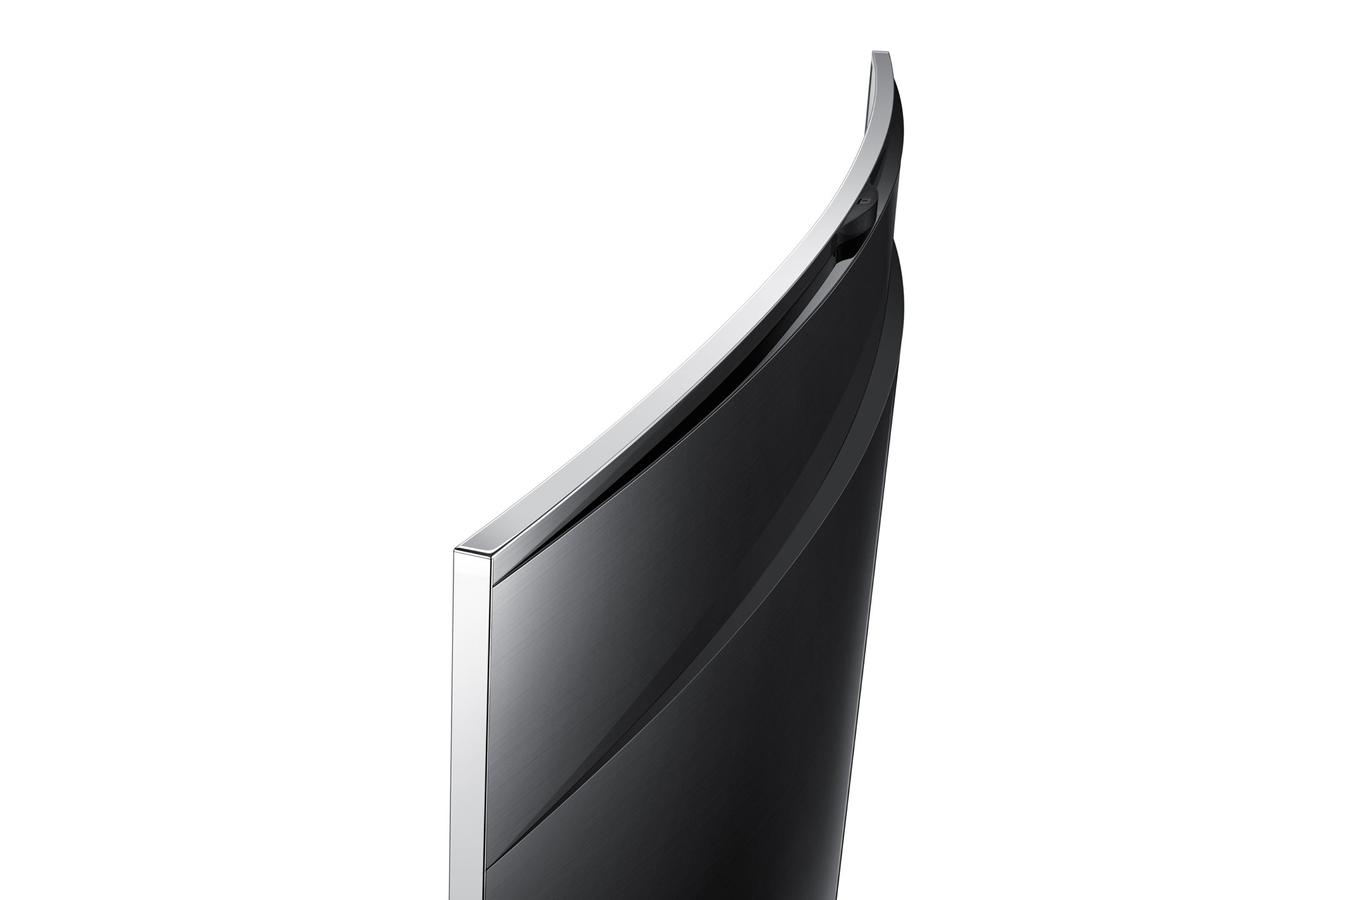 tv led samsung ue65hu8500 4k uhd c 65hu8500 4002741. Black Bedroom Furniture Sets. Home Design Ideas